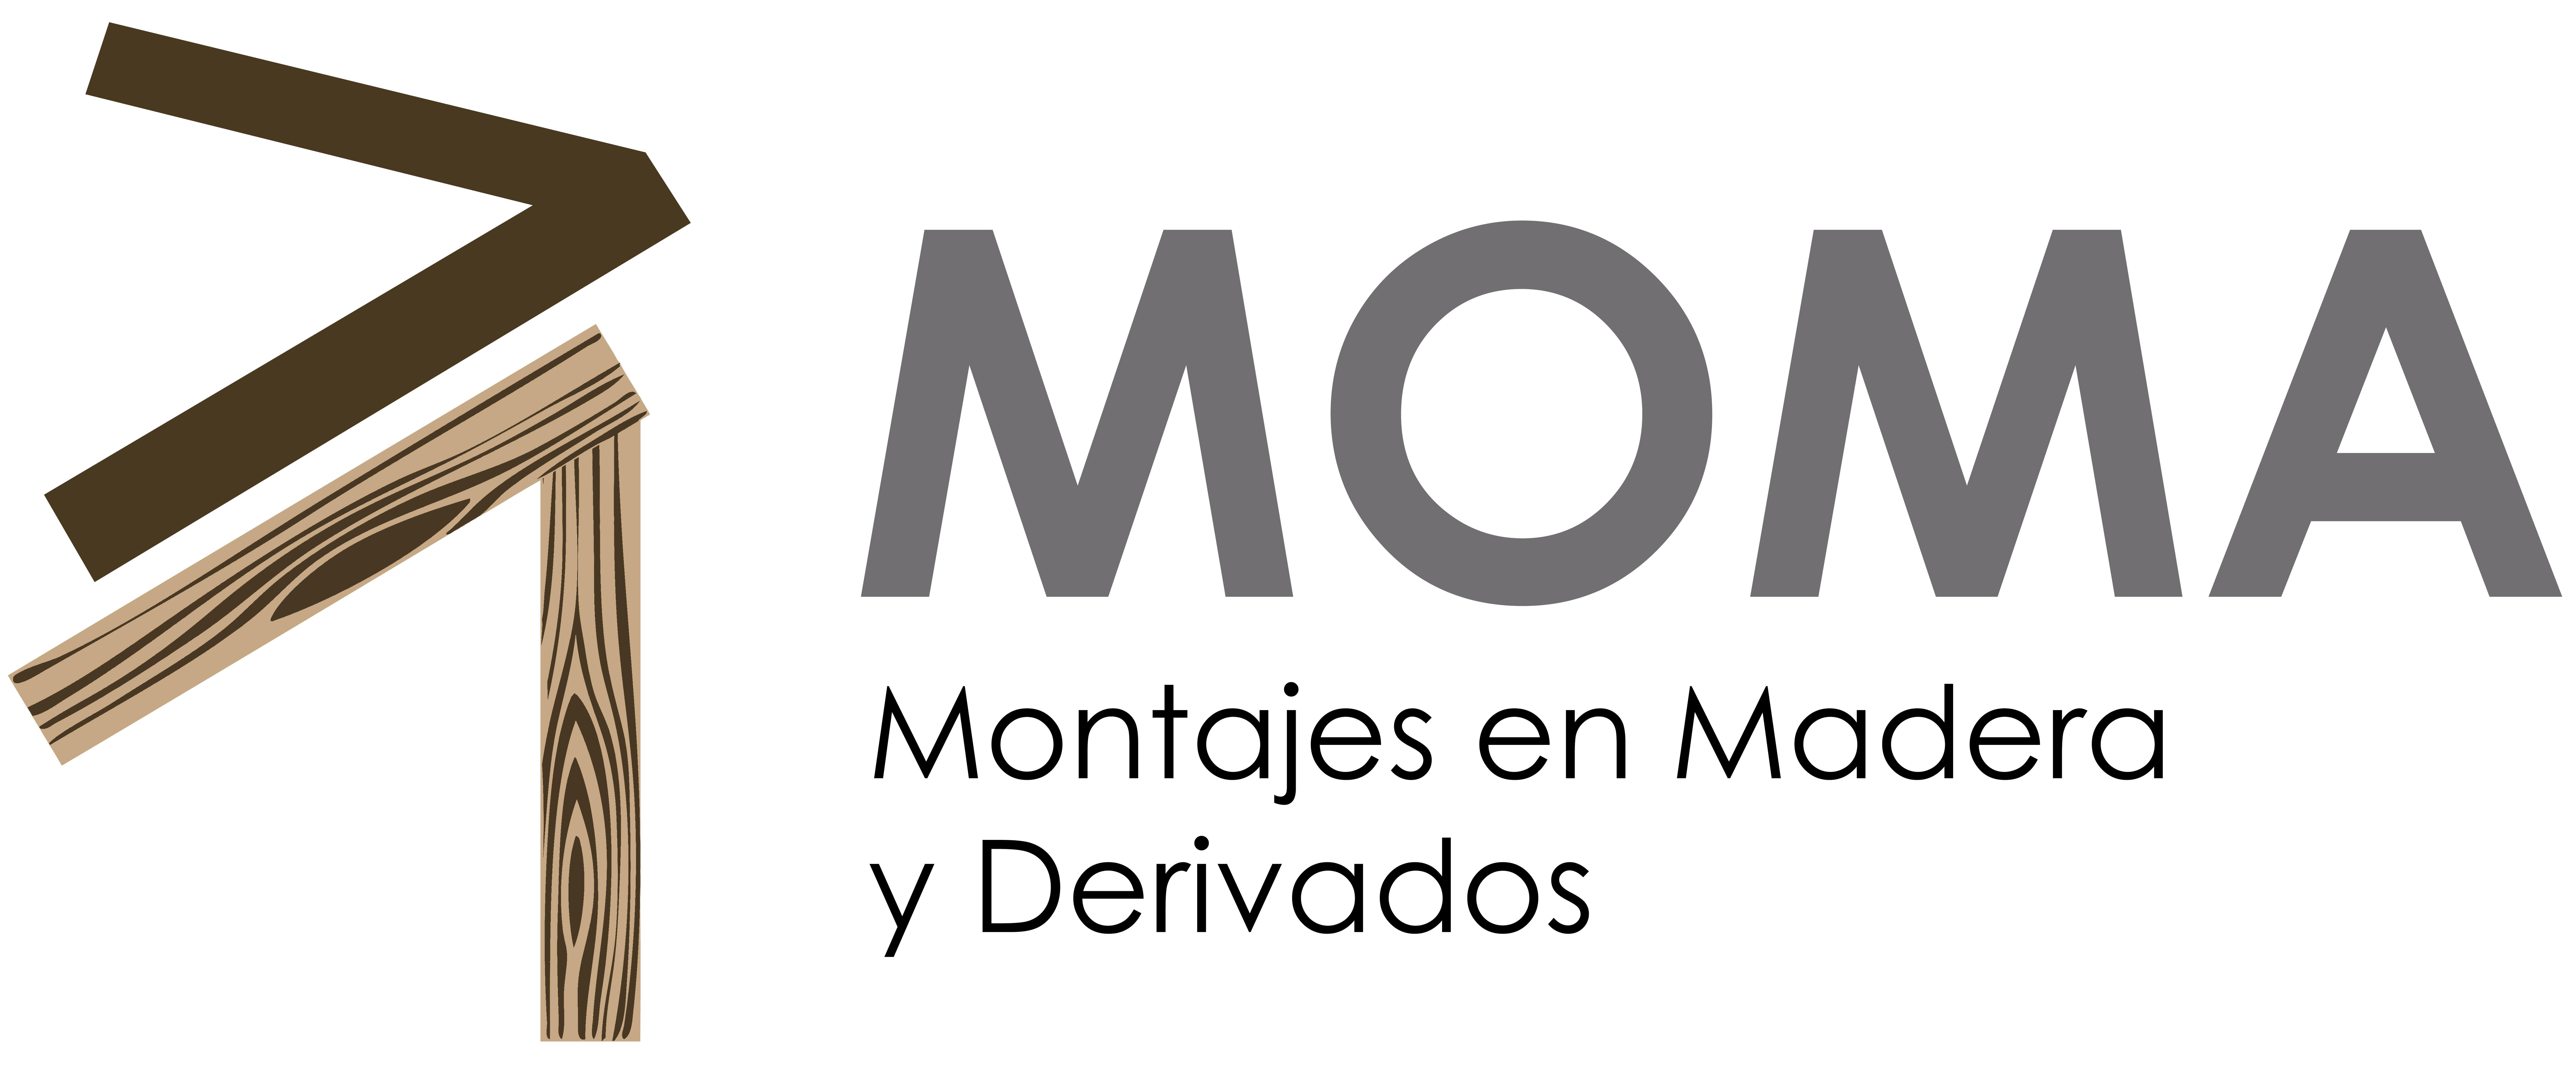 Carpinteria MOMA